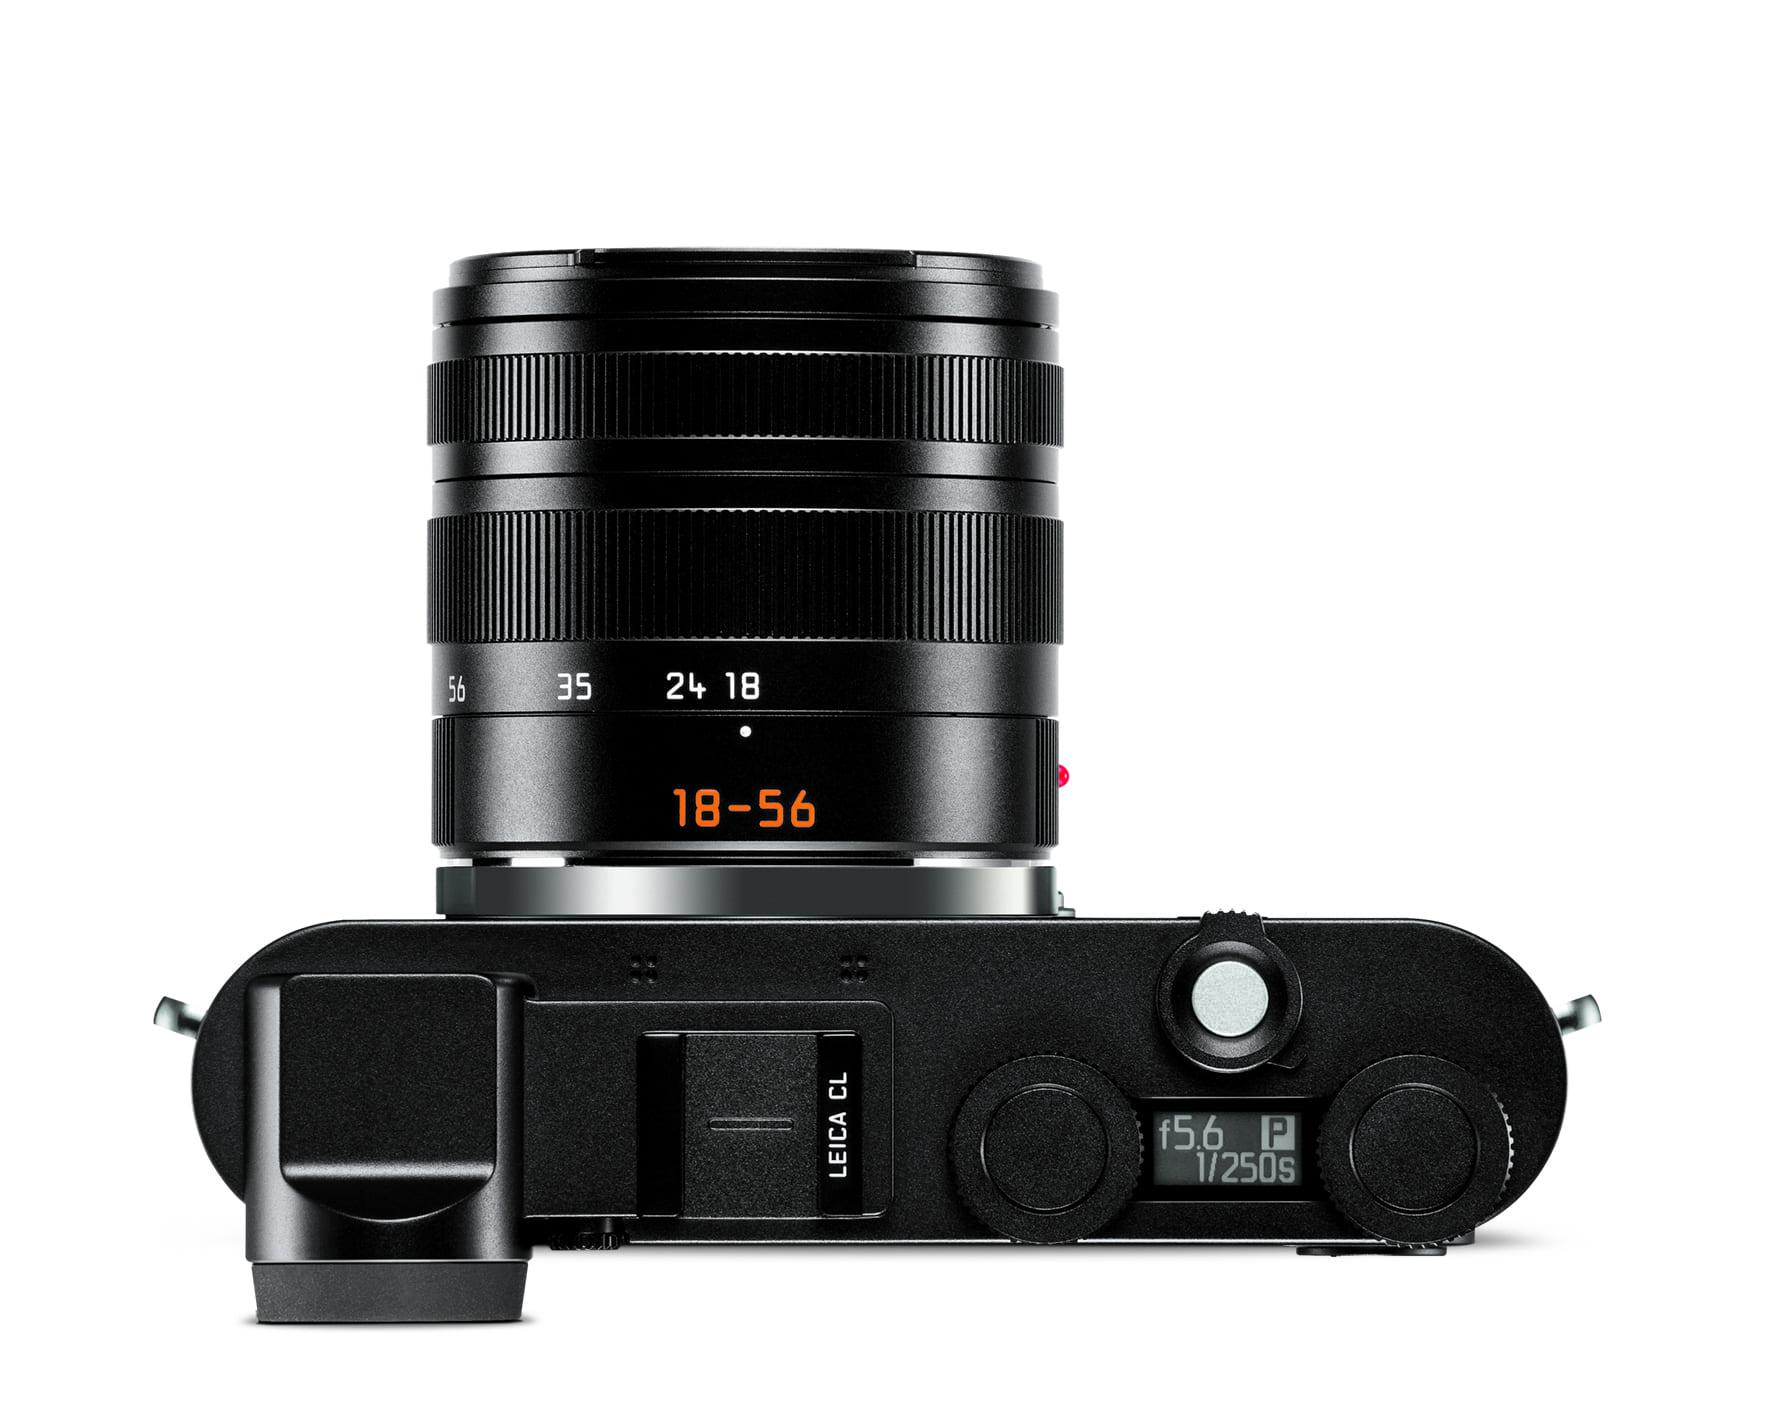 Leica-CL_top-1.jpg